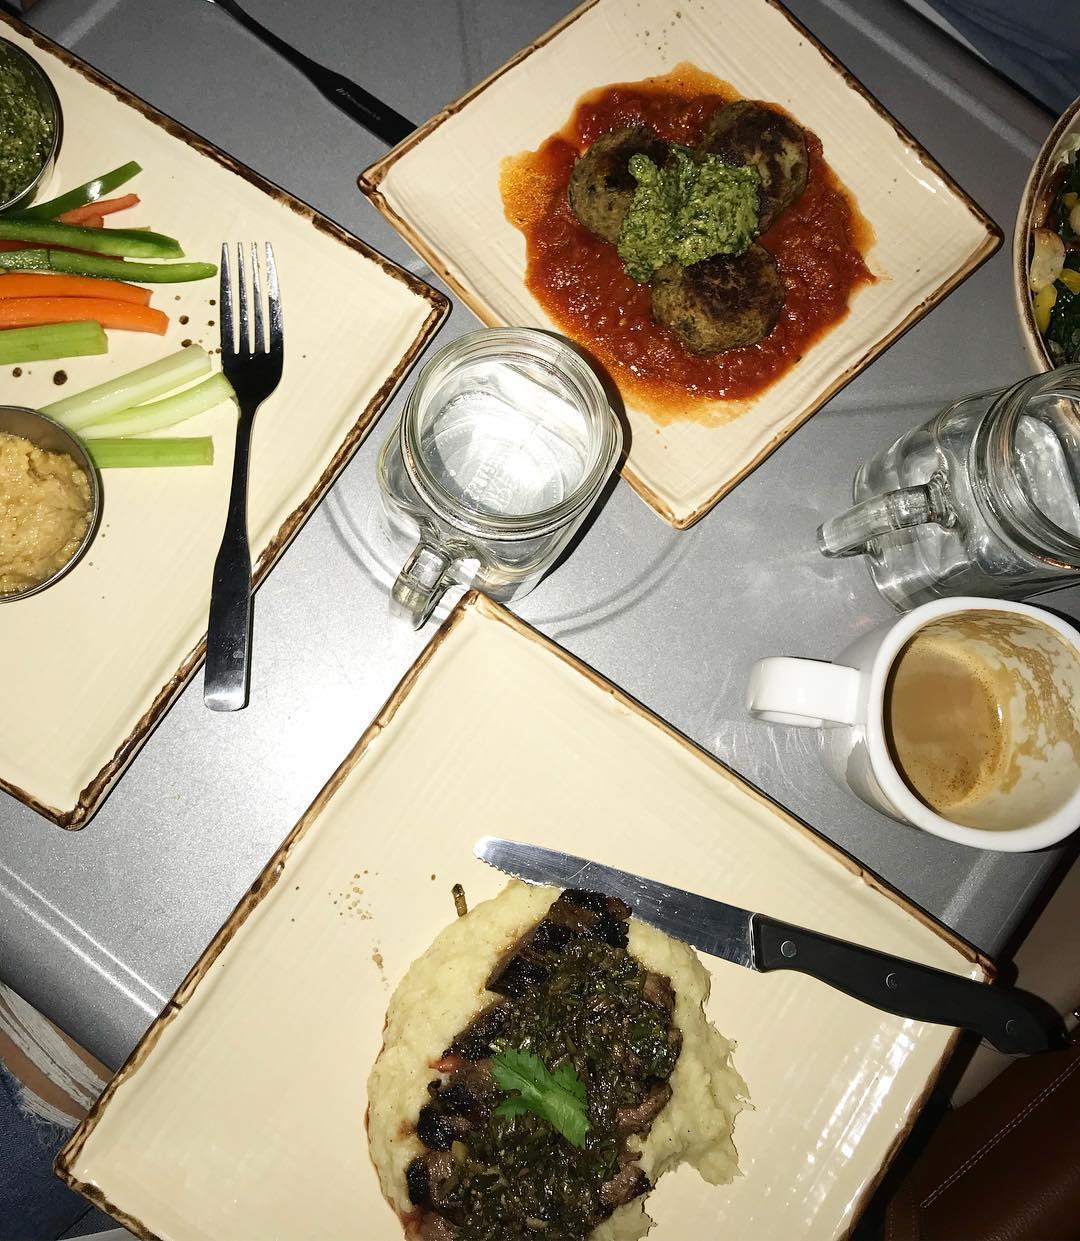 Primal Kitchen: Visual Menu/Reviews by Food Bloggers/Instagrammers